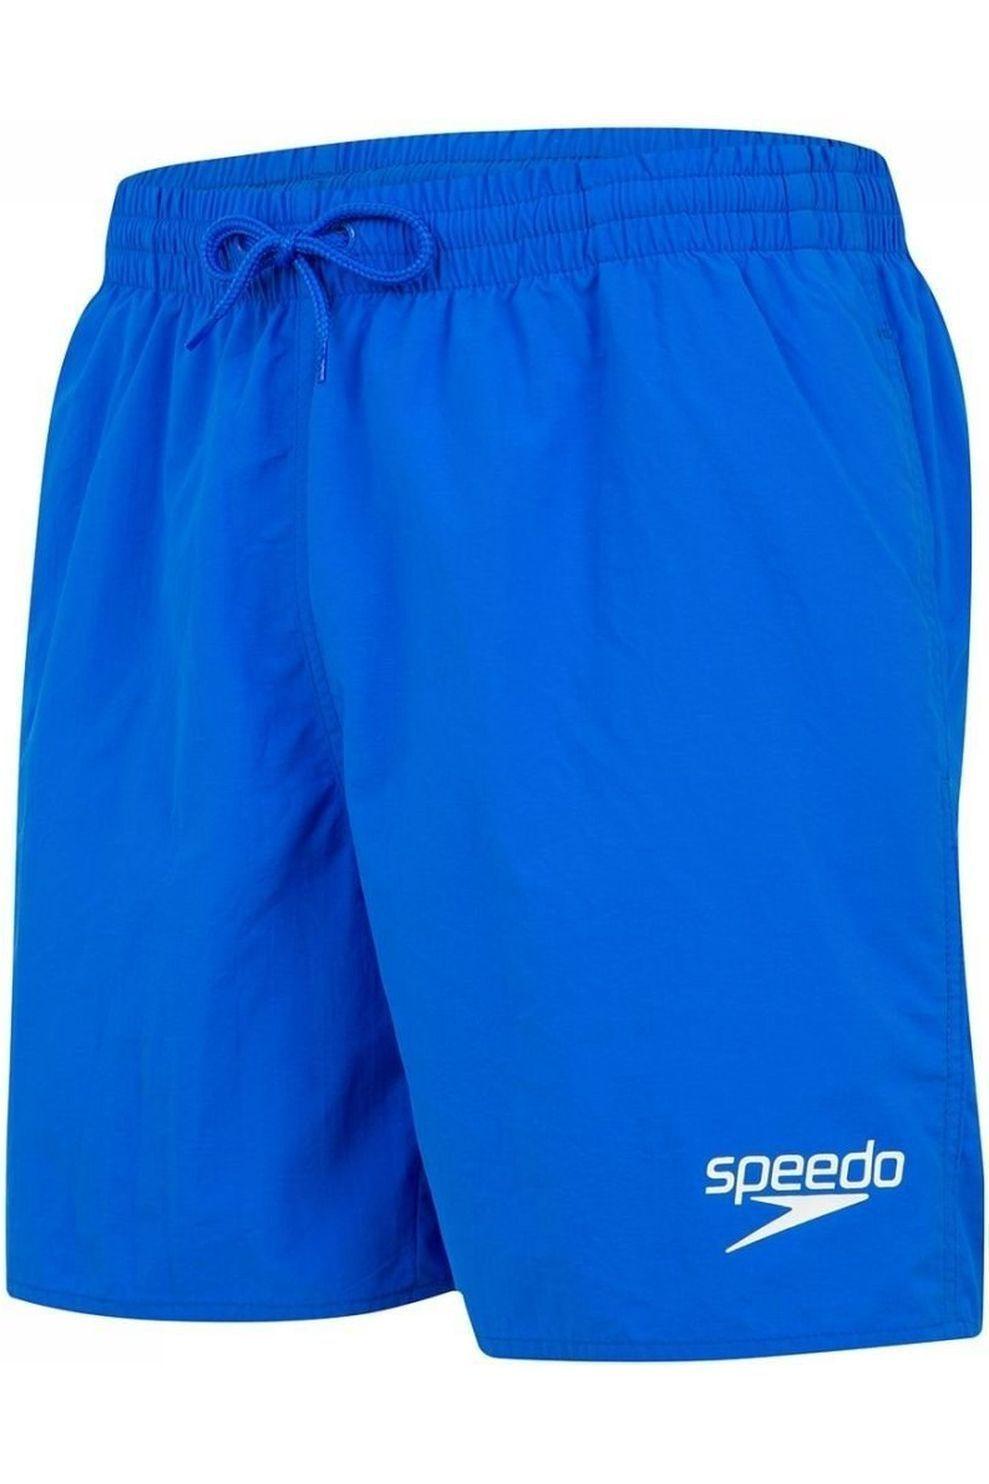 Speedo Zwemshort Essentials 16 voor heren - Blauw - Maten: XS, S, M, L, XL, XXL